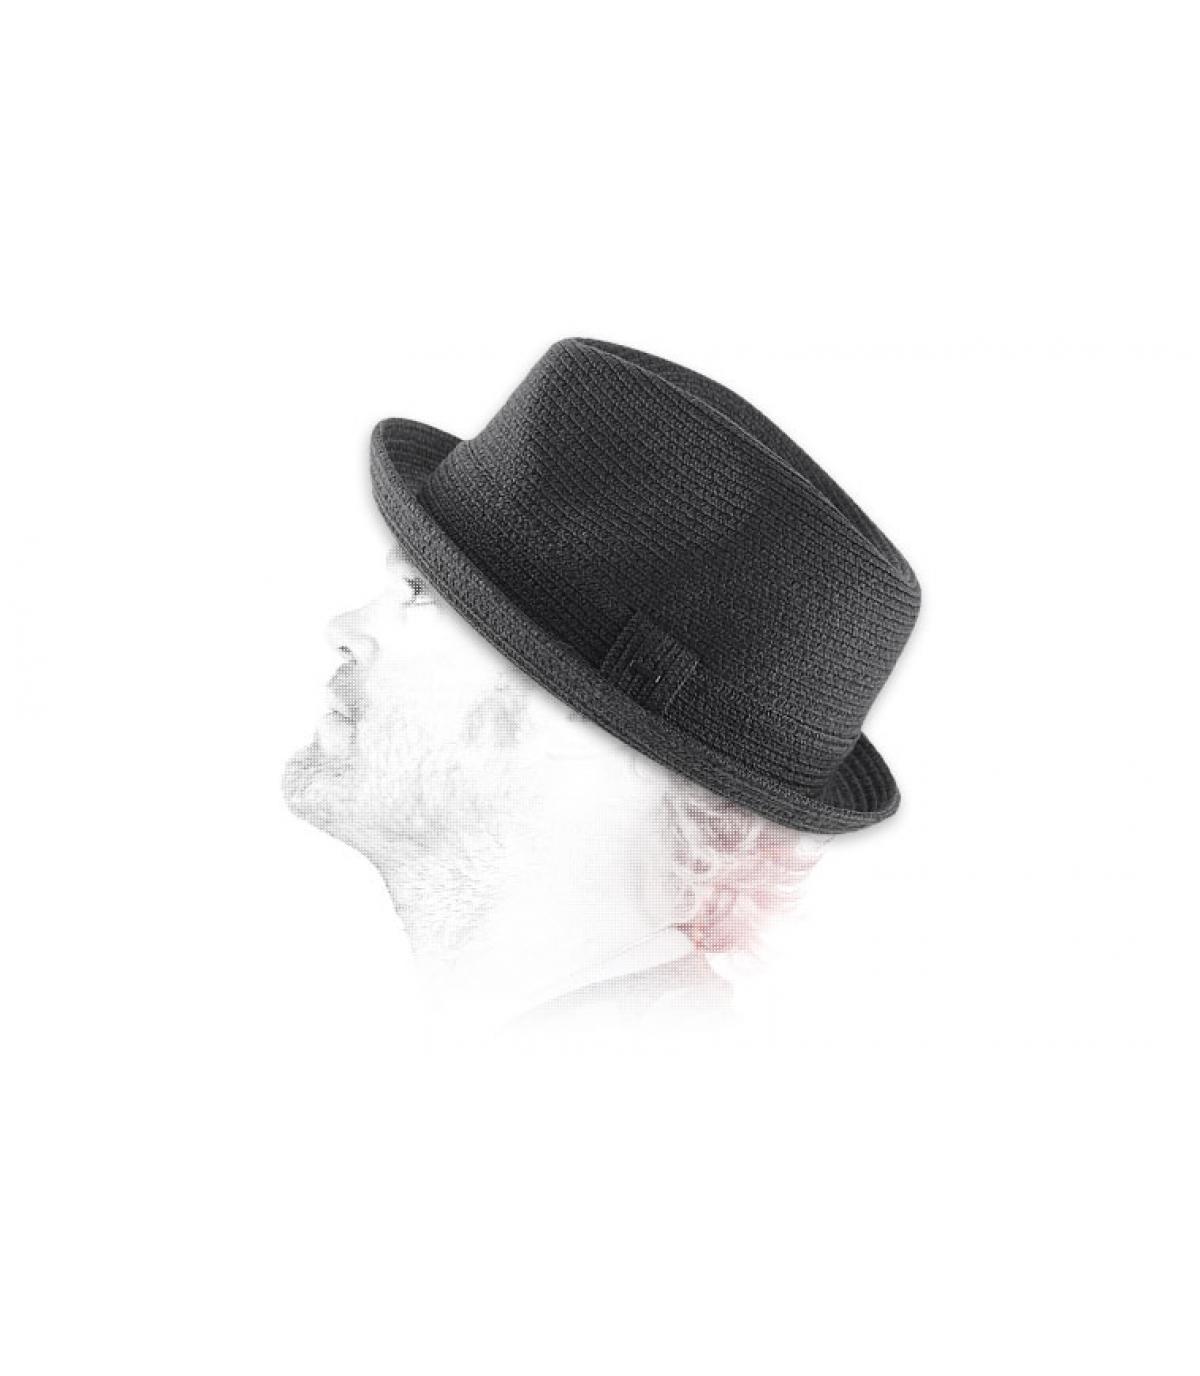 Détails Billy black hat - image 3